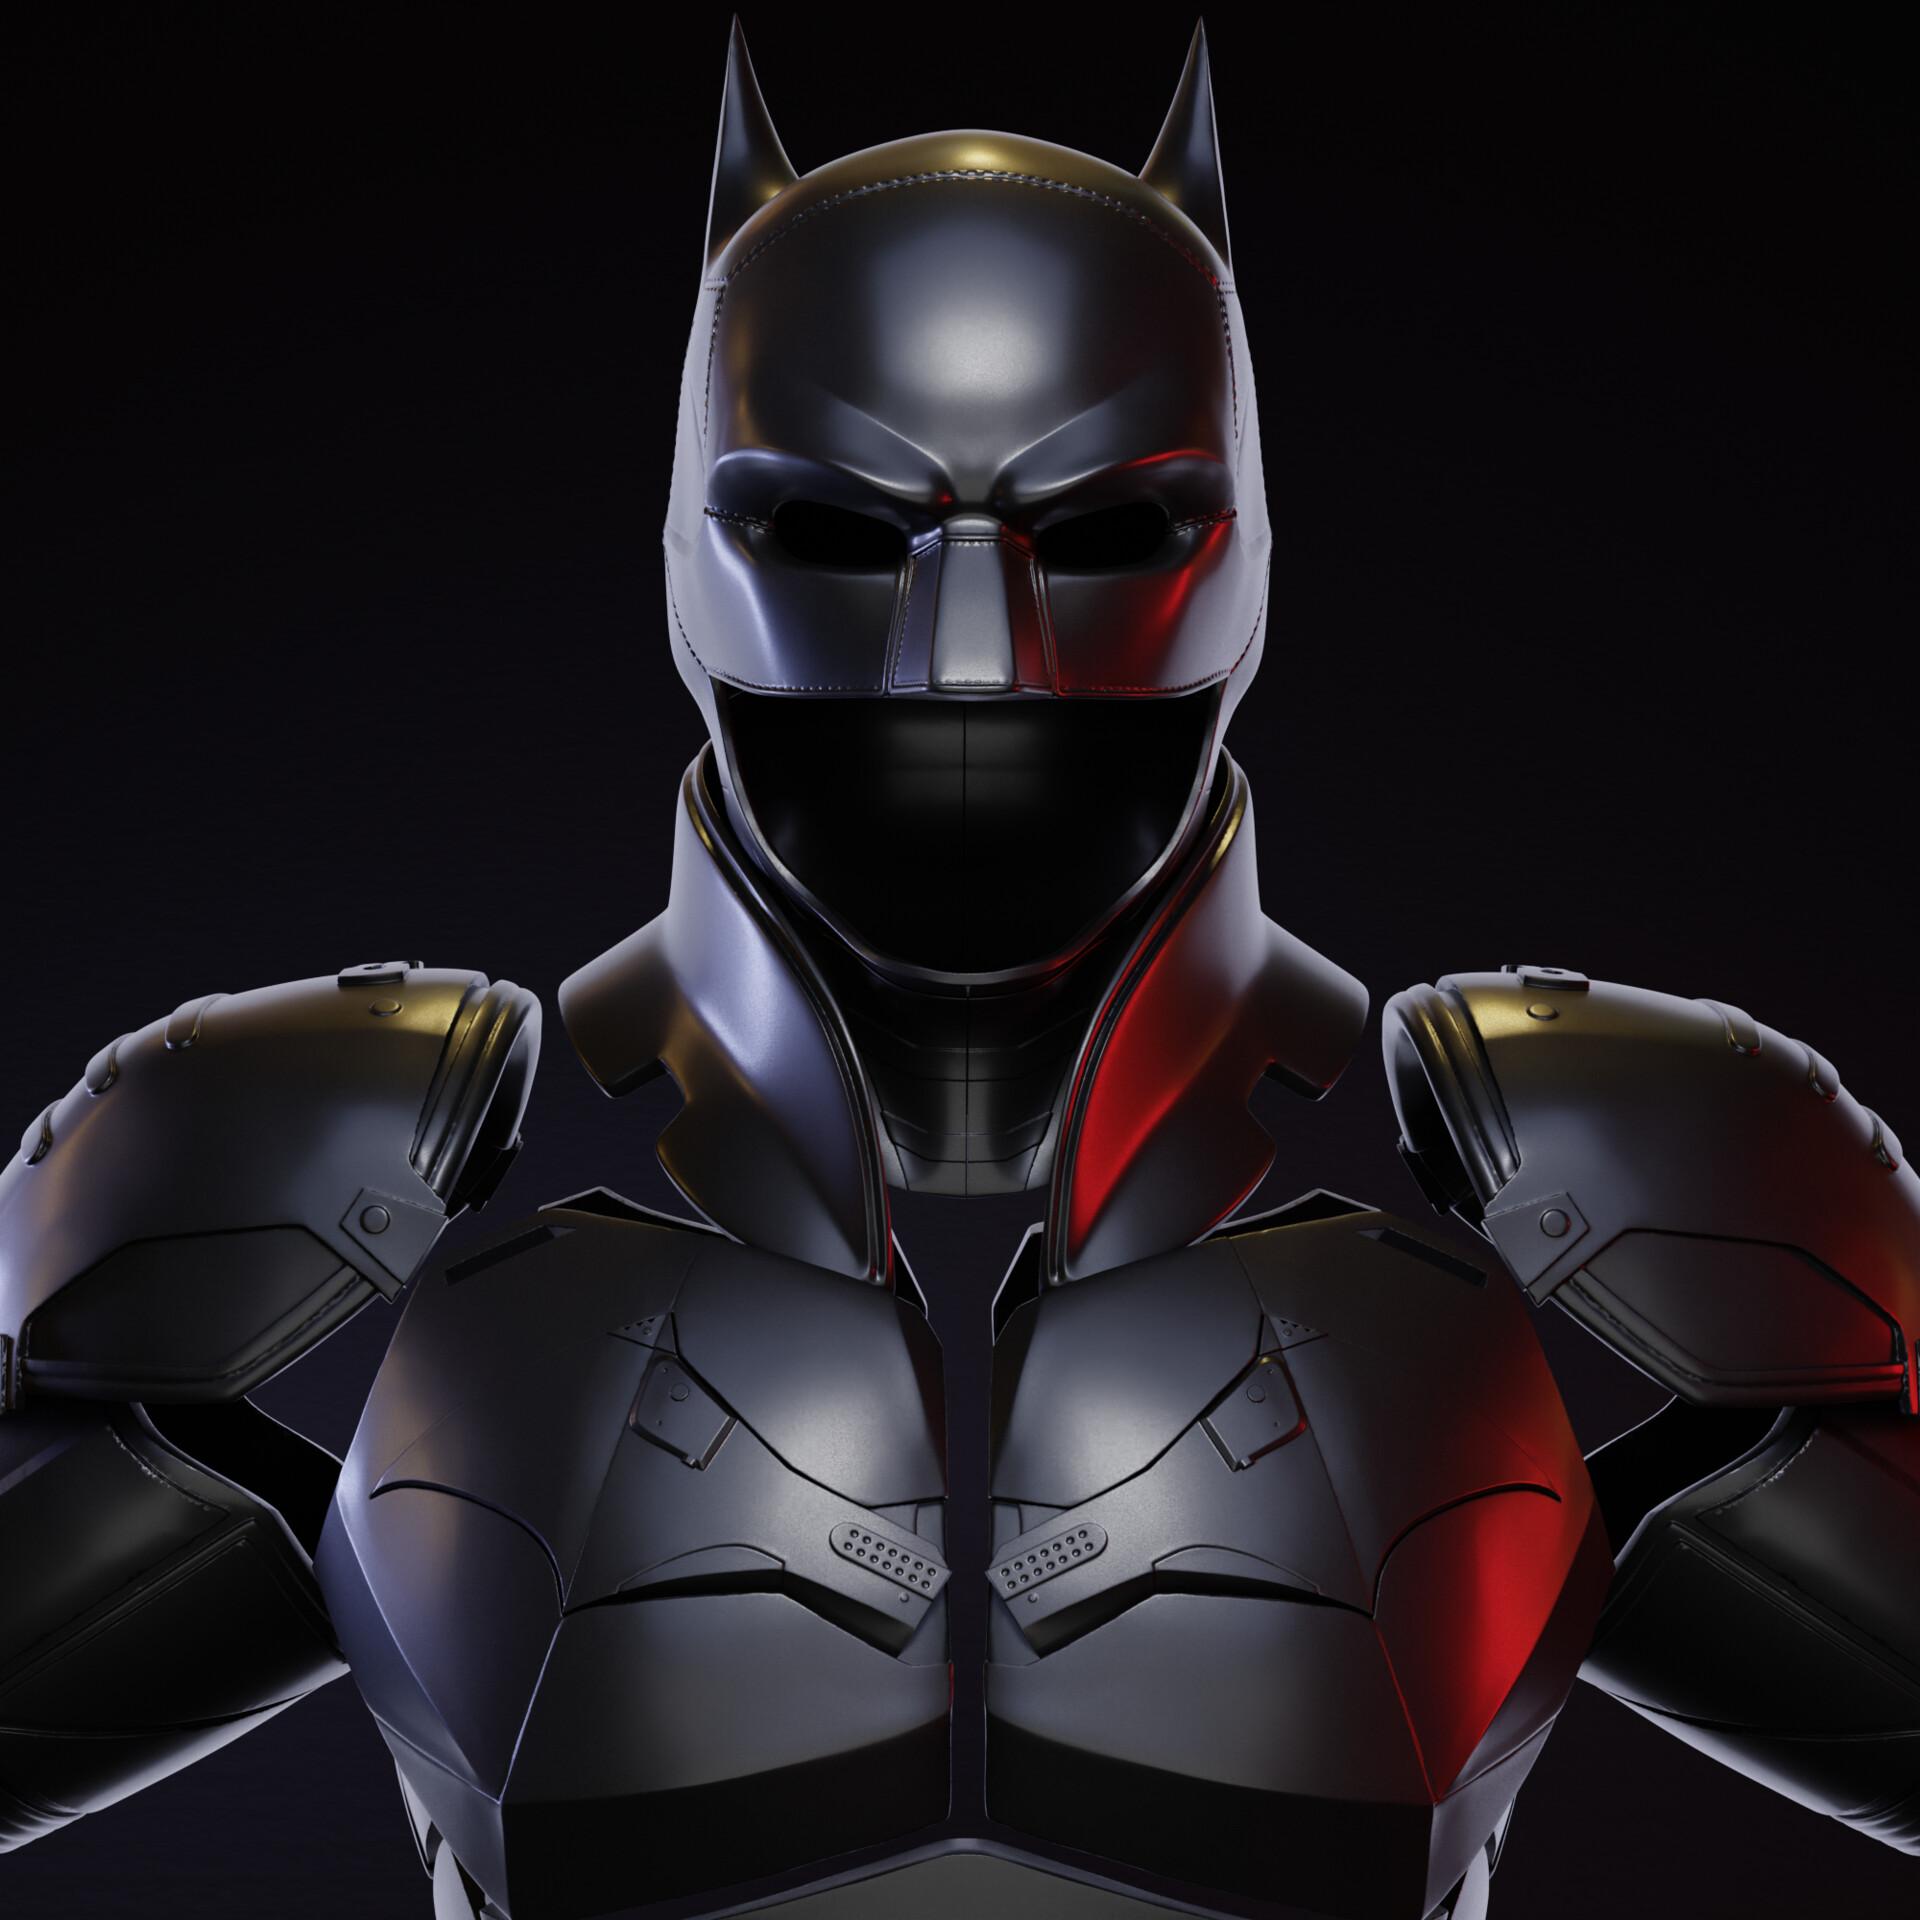 3D printed Batman 2021 Battison Batarang Trailer Inspired Prop Utility Robert Pattinson